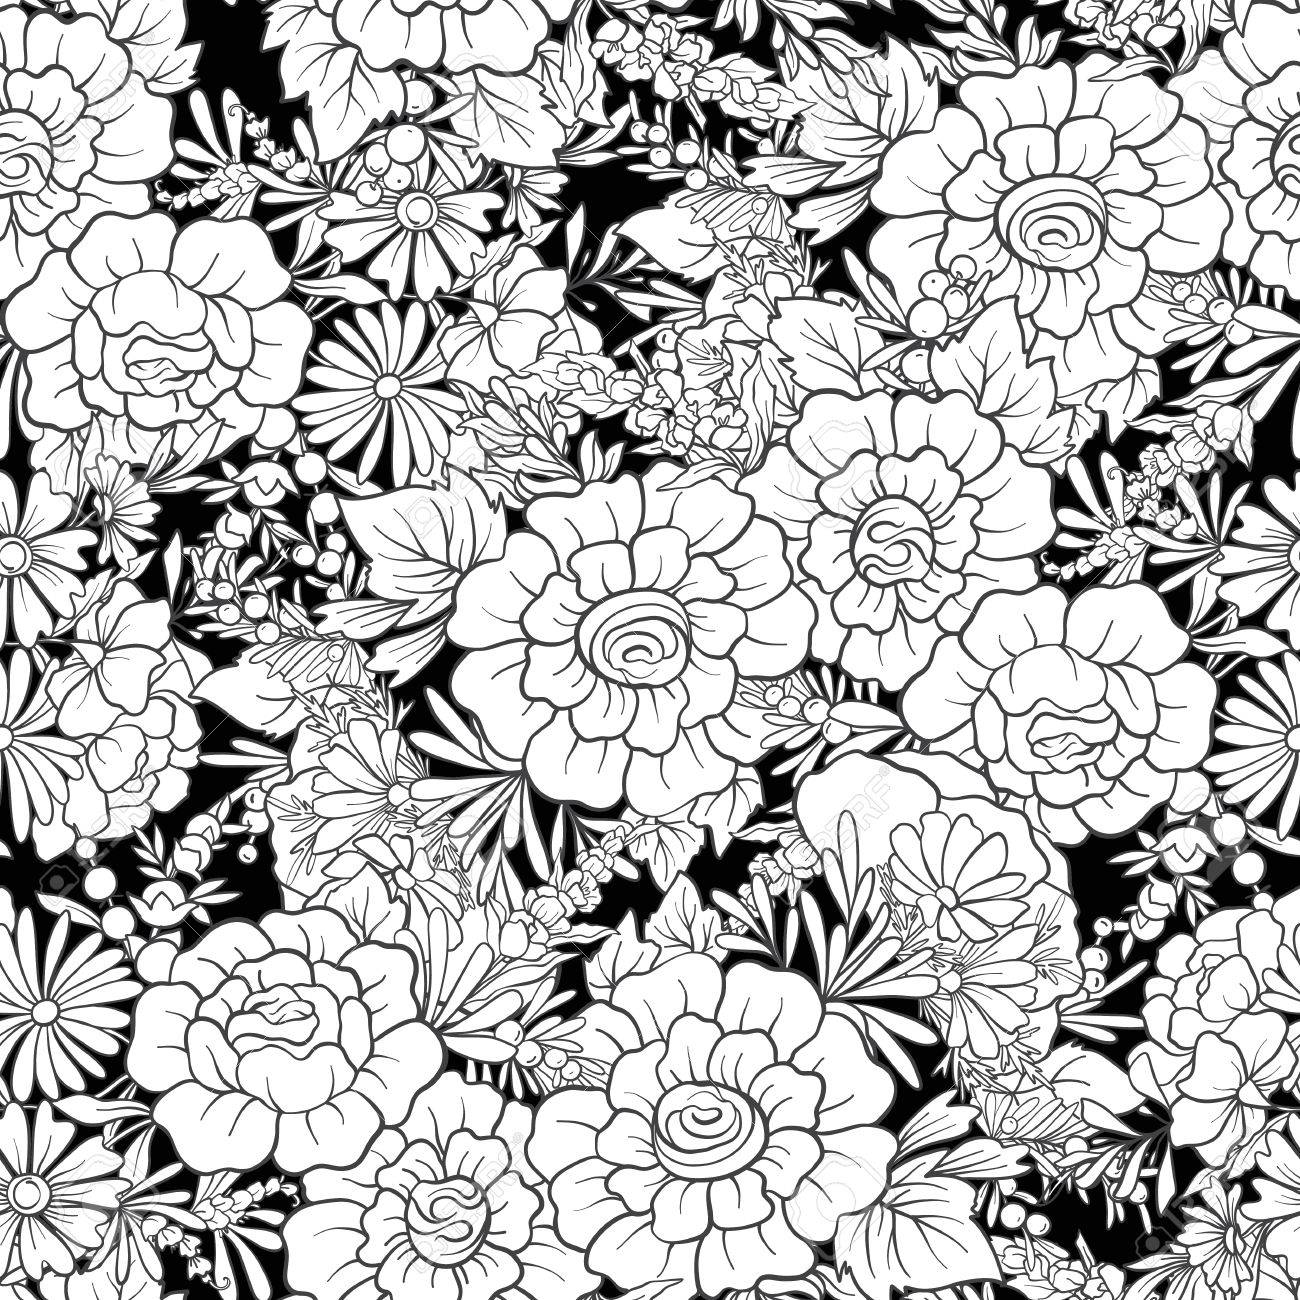 Floral seamless pattern - 81945717